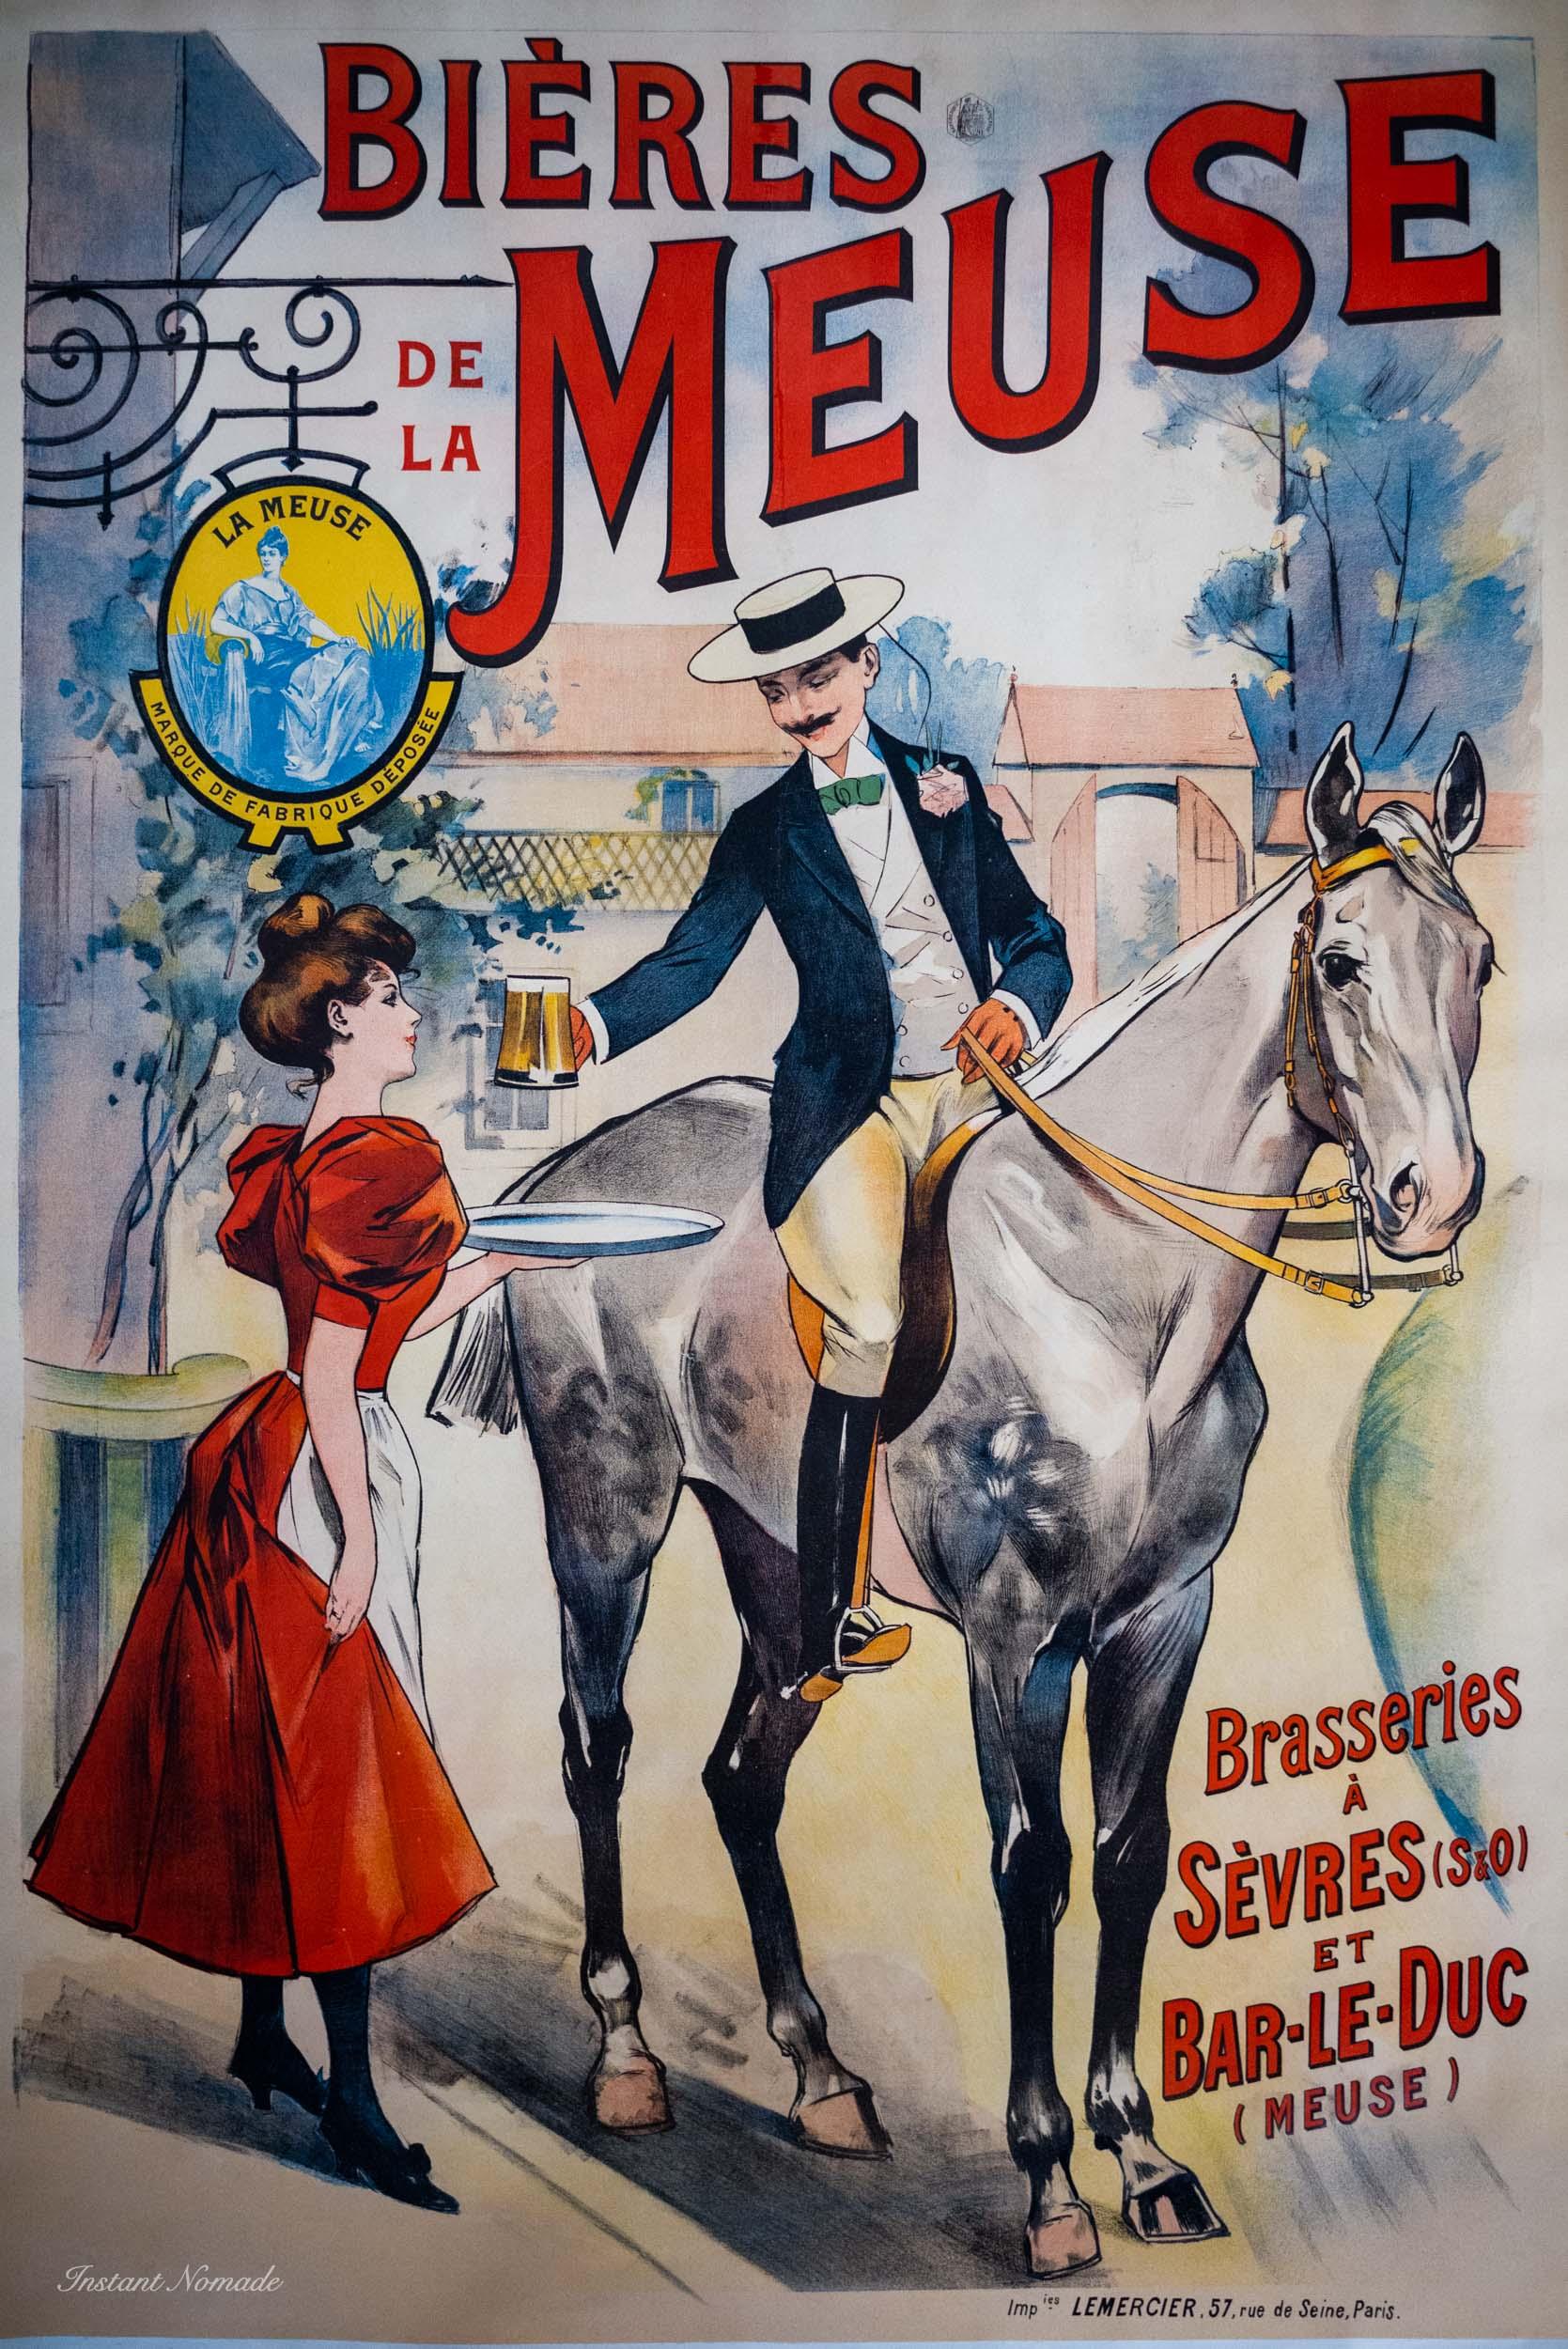 affiche musee de la biere stenay meuse